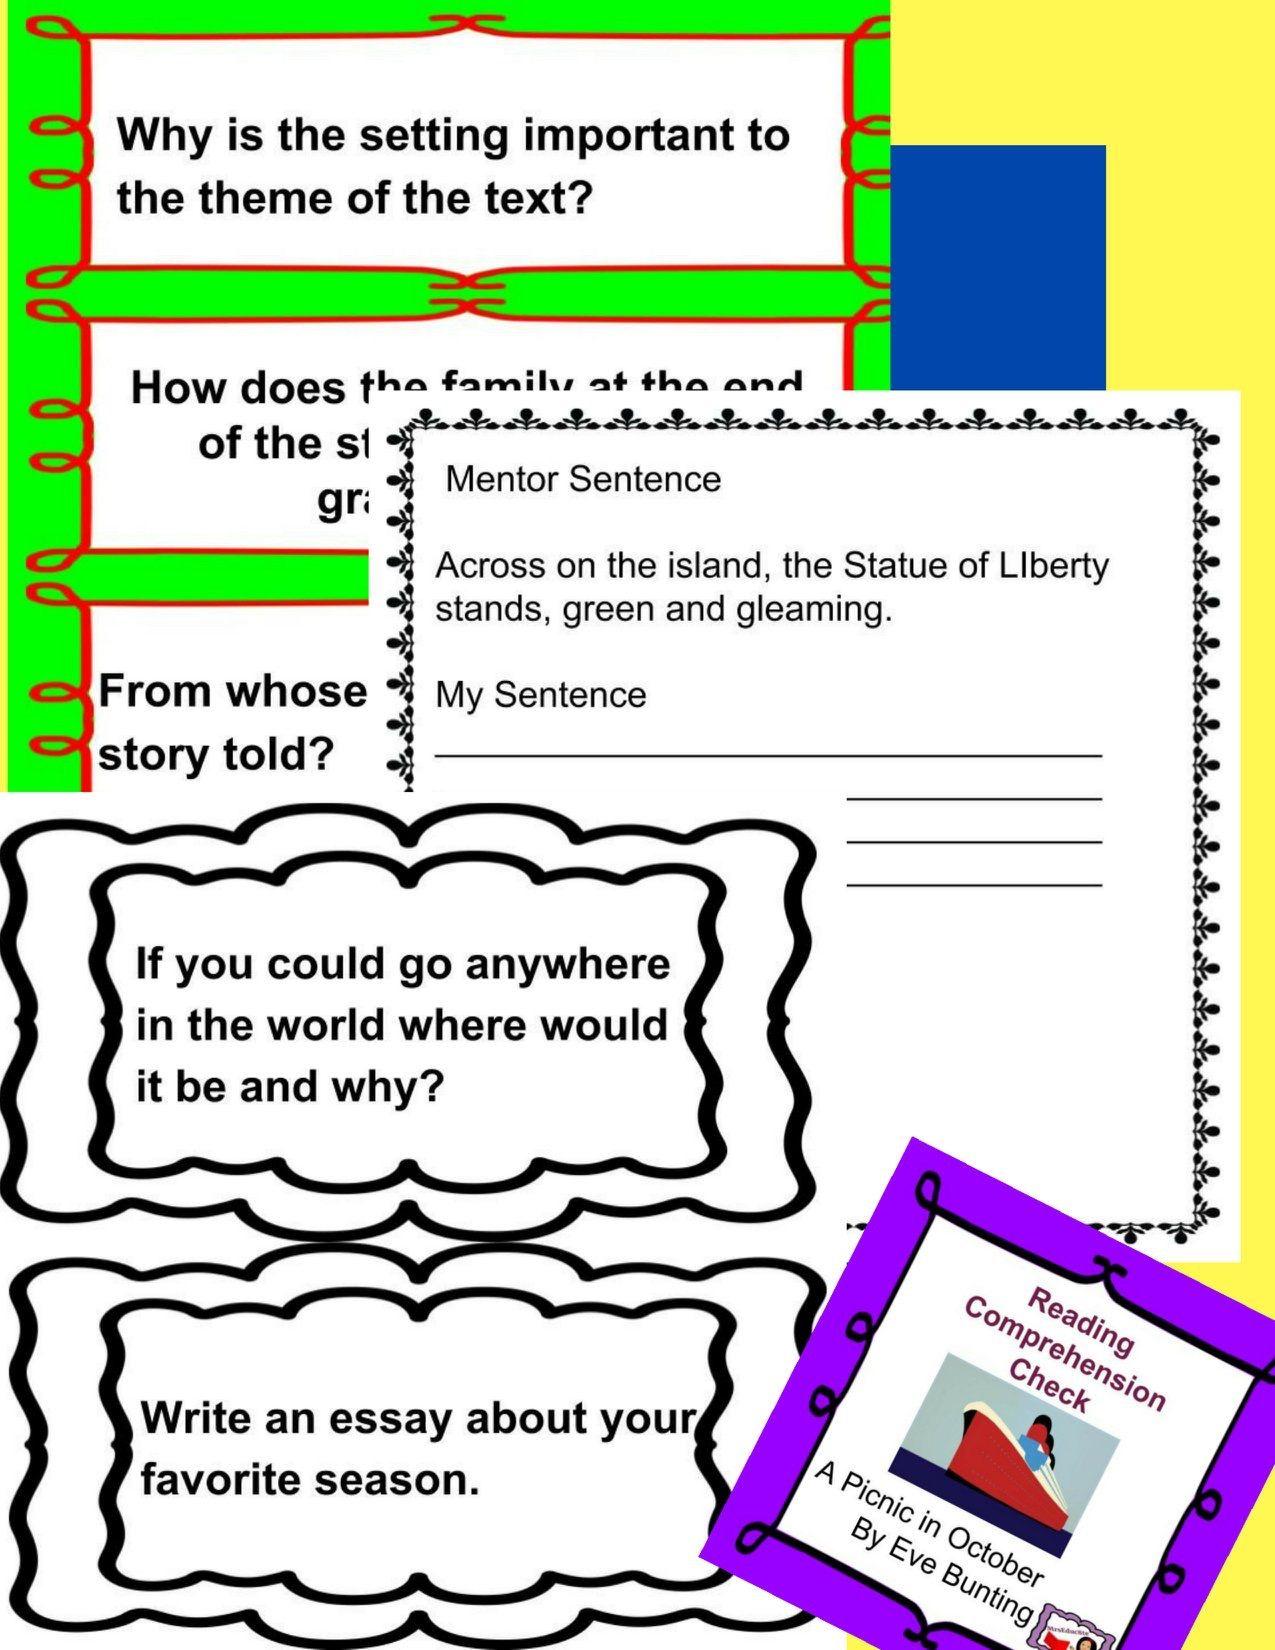 Sample 3 Original Sports Reading Comprehension Passages With Close Re Reading Comprehension Passages Free Reading Comprehension Passages Reading Comprehension